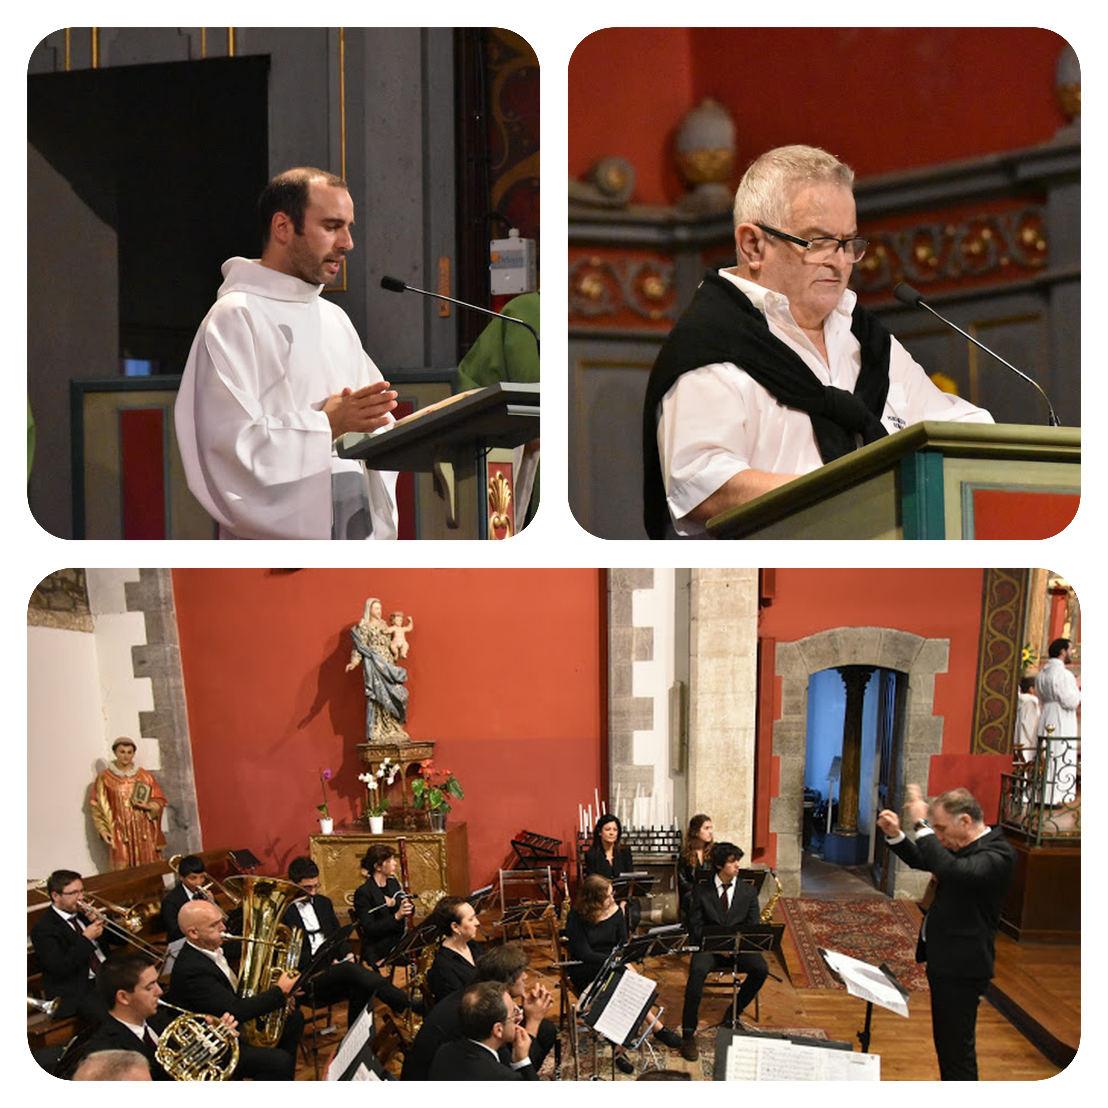 Iban et Benito et refrain en polyphonie musicale